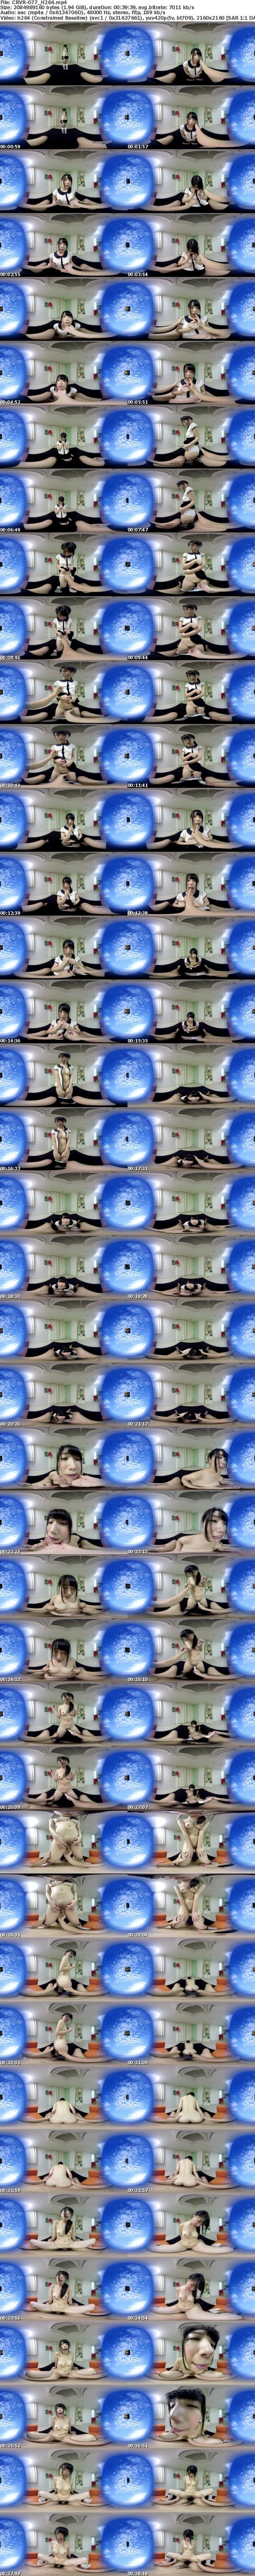 VR/3D CRVR-077 【VR】これからこの娘をハメ撮ります。パイパン超敏感美少女 みひな